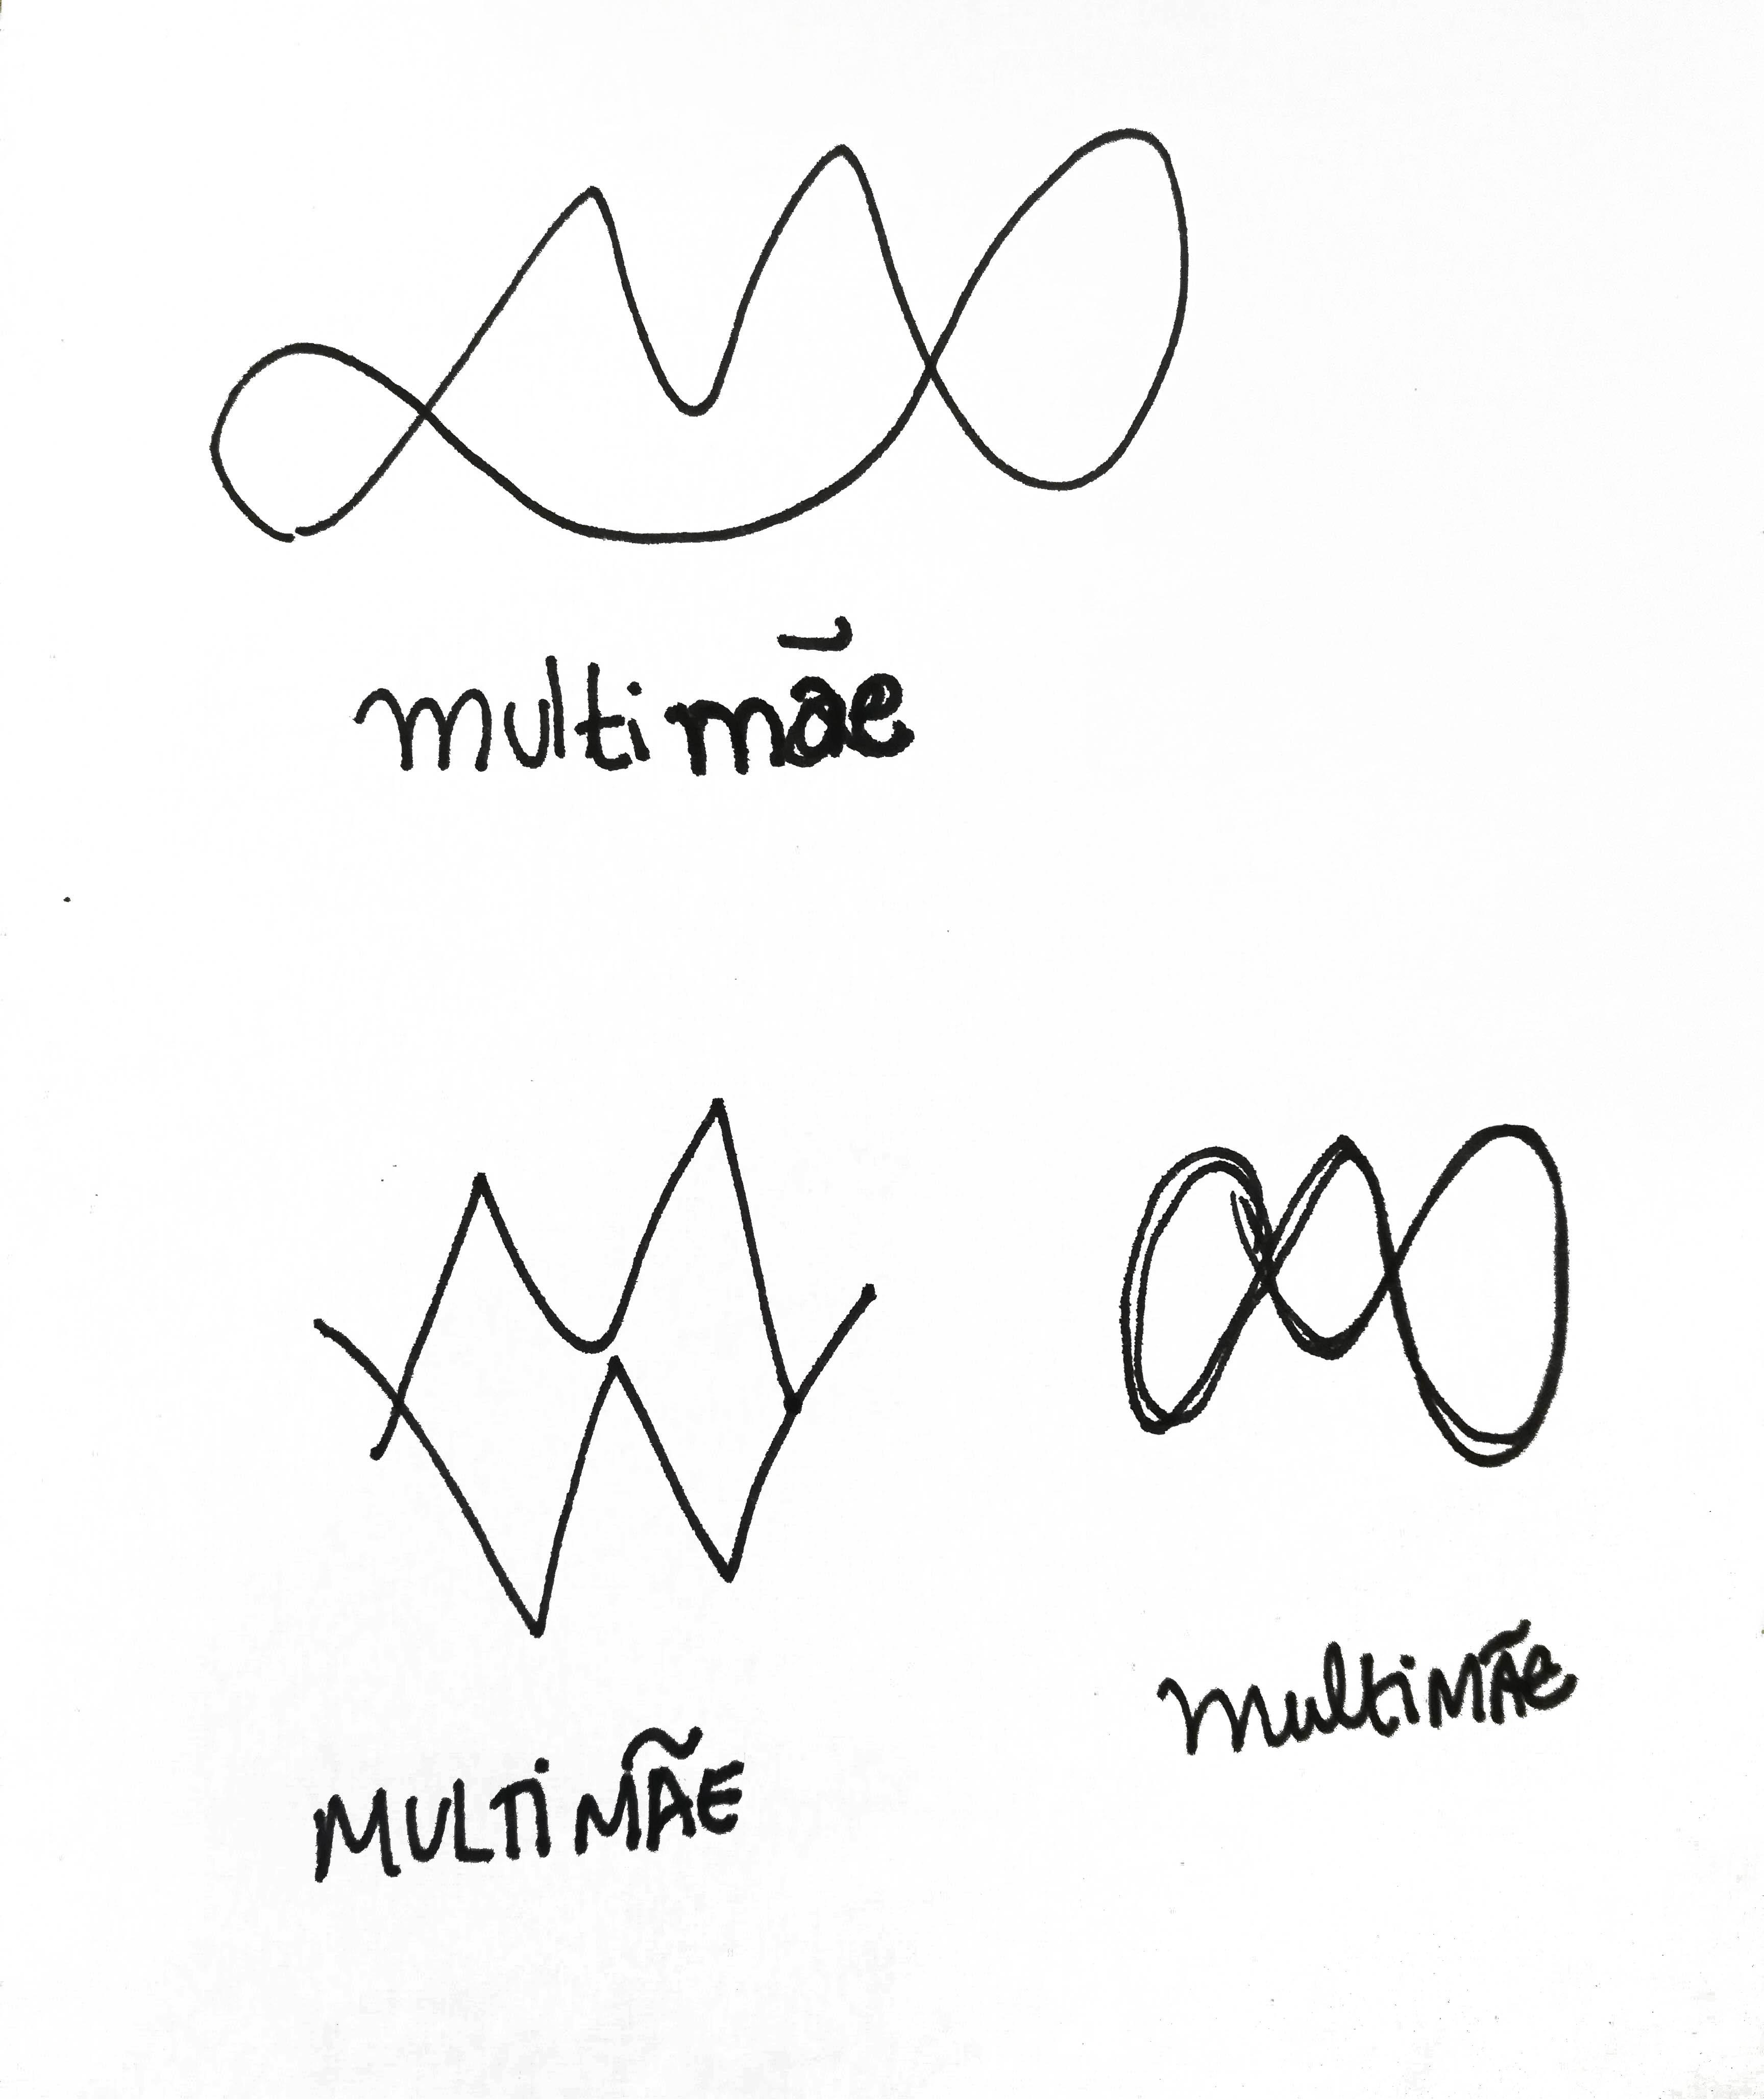 multimae desenho